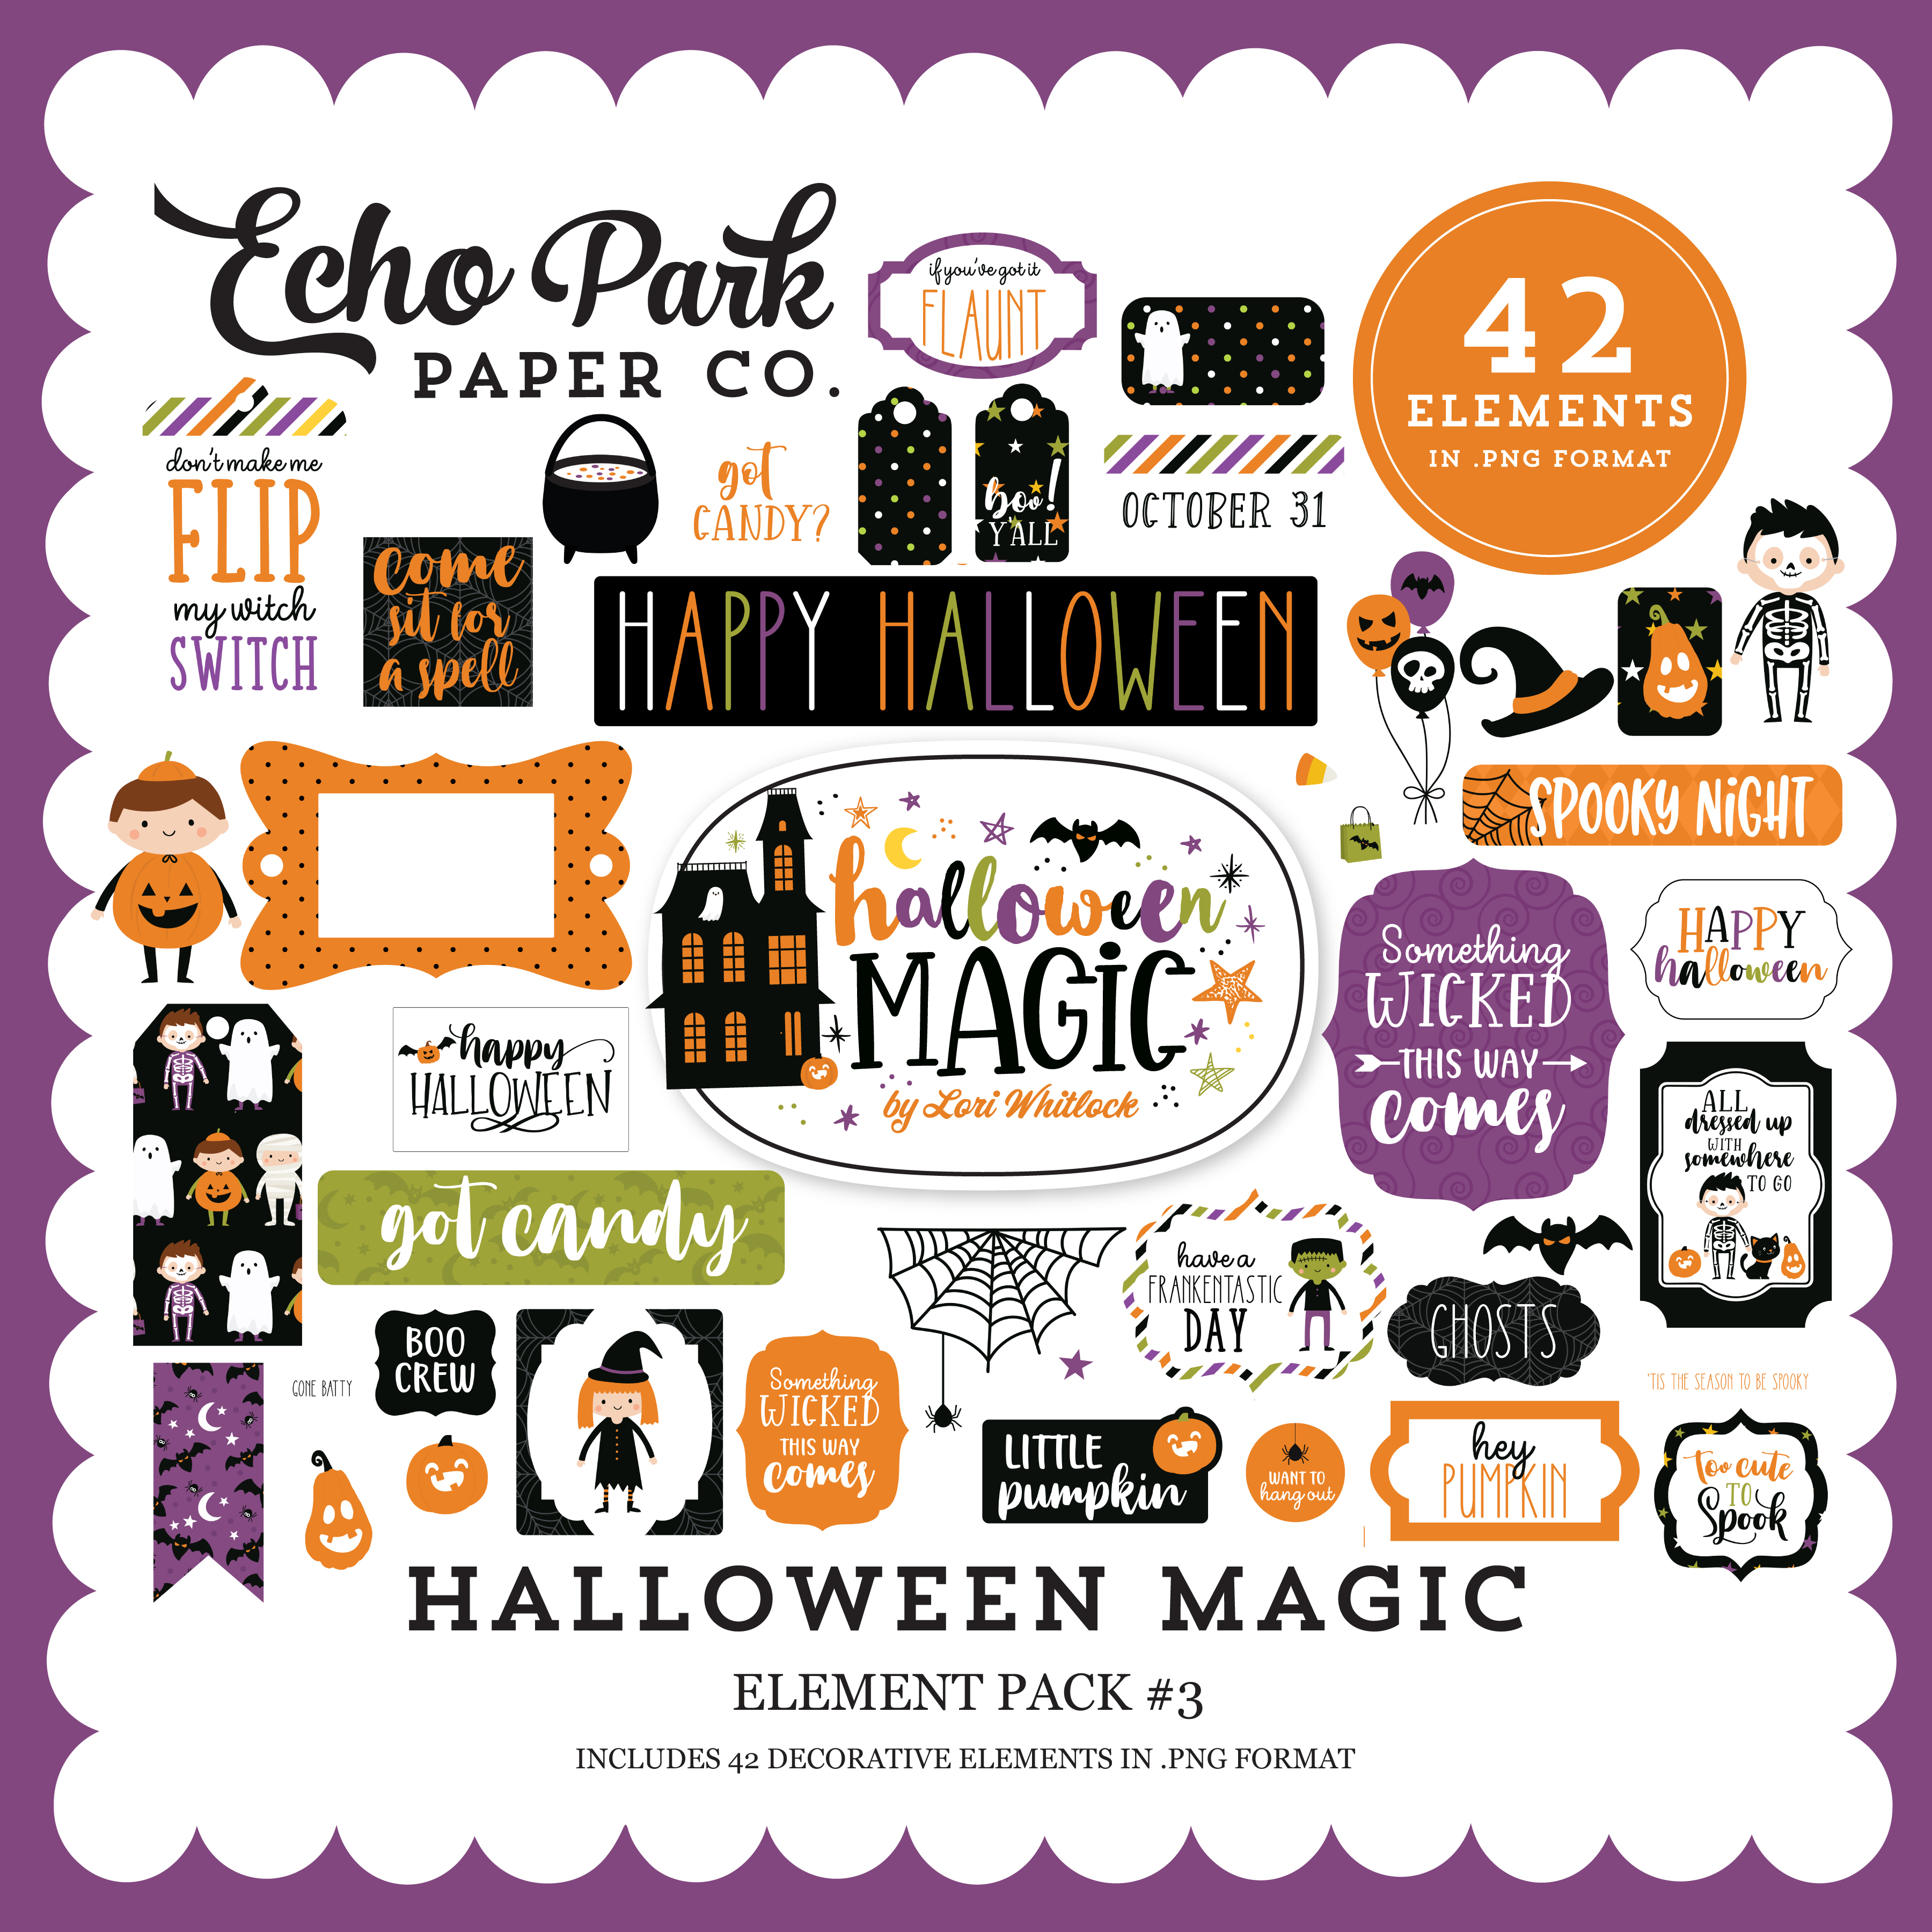 Halloween Magic Element Pack #3